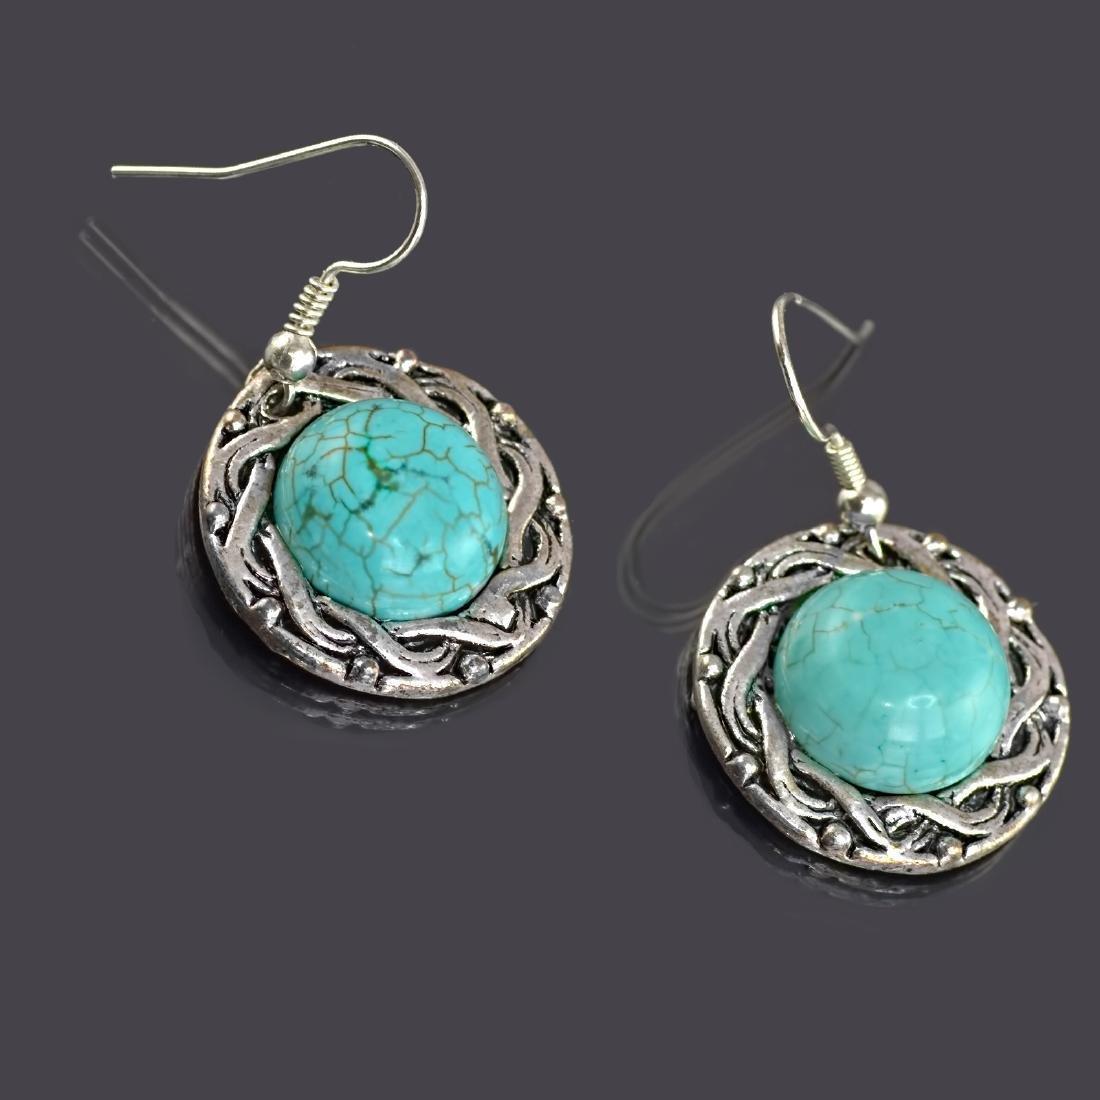 Ethnic Style Turquoise Howlite Earrings - 2